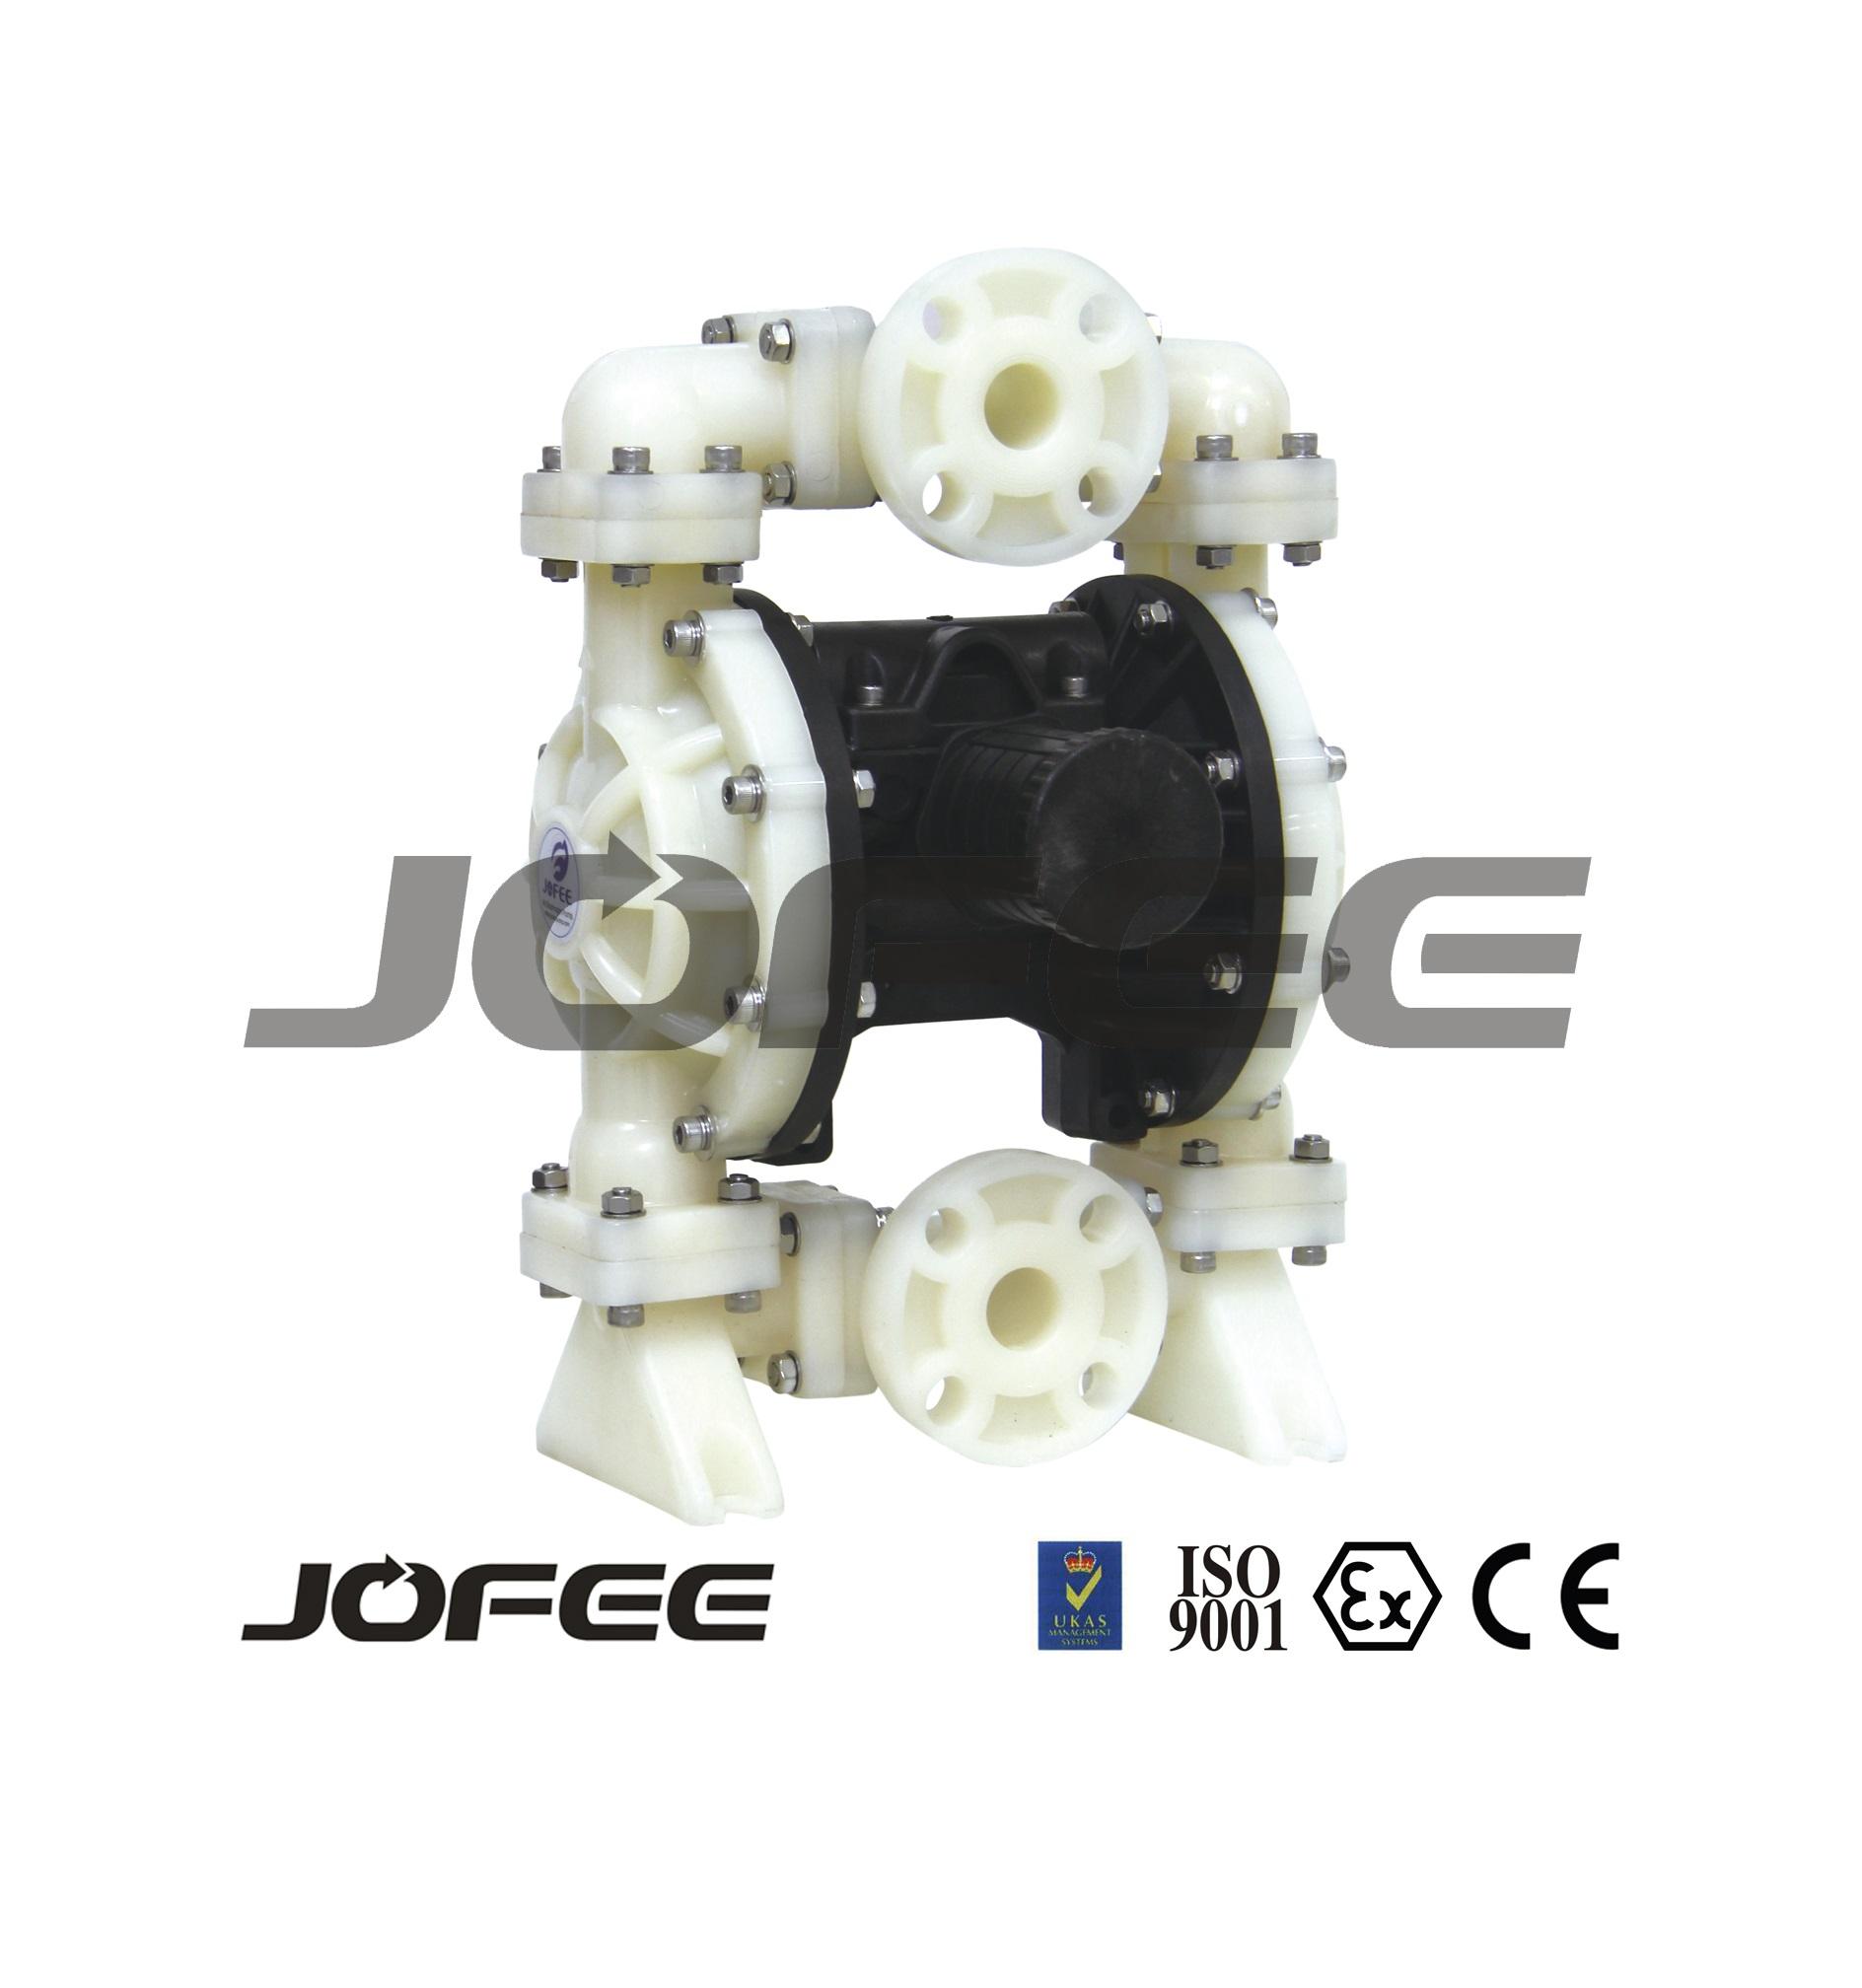 Bom-mang-jofee-mk25-nm